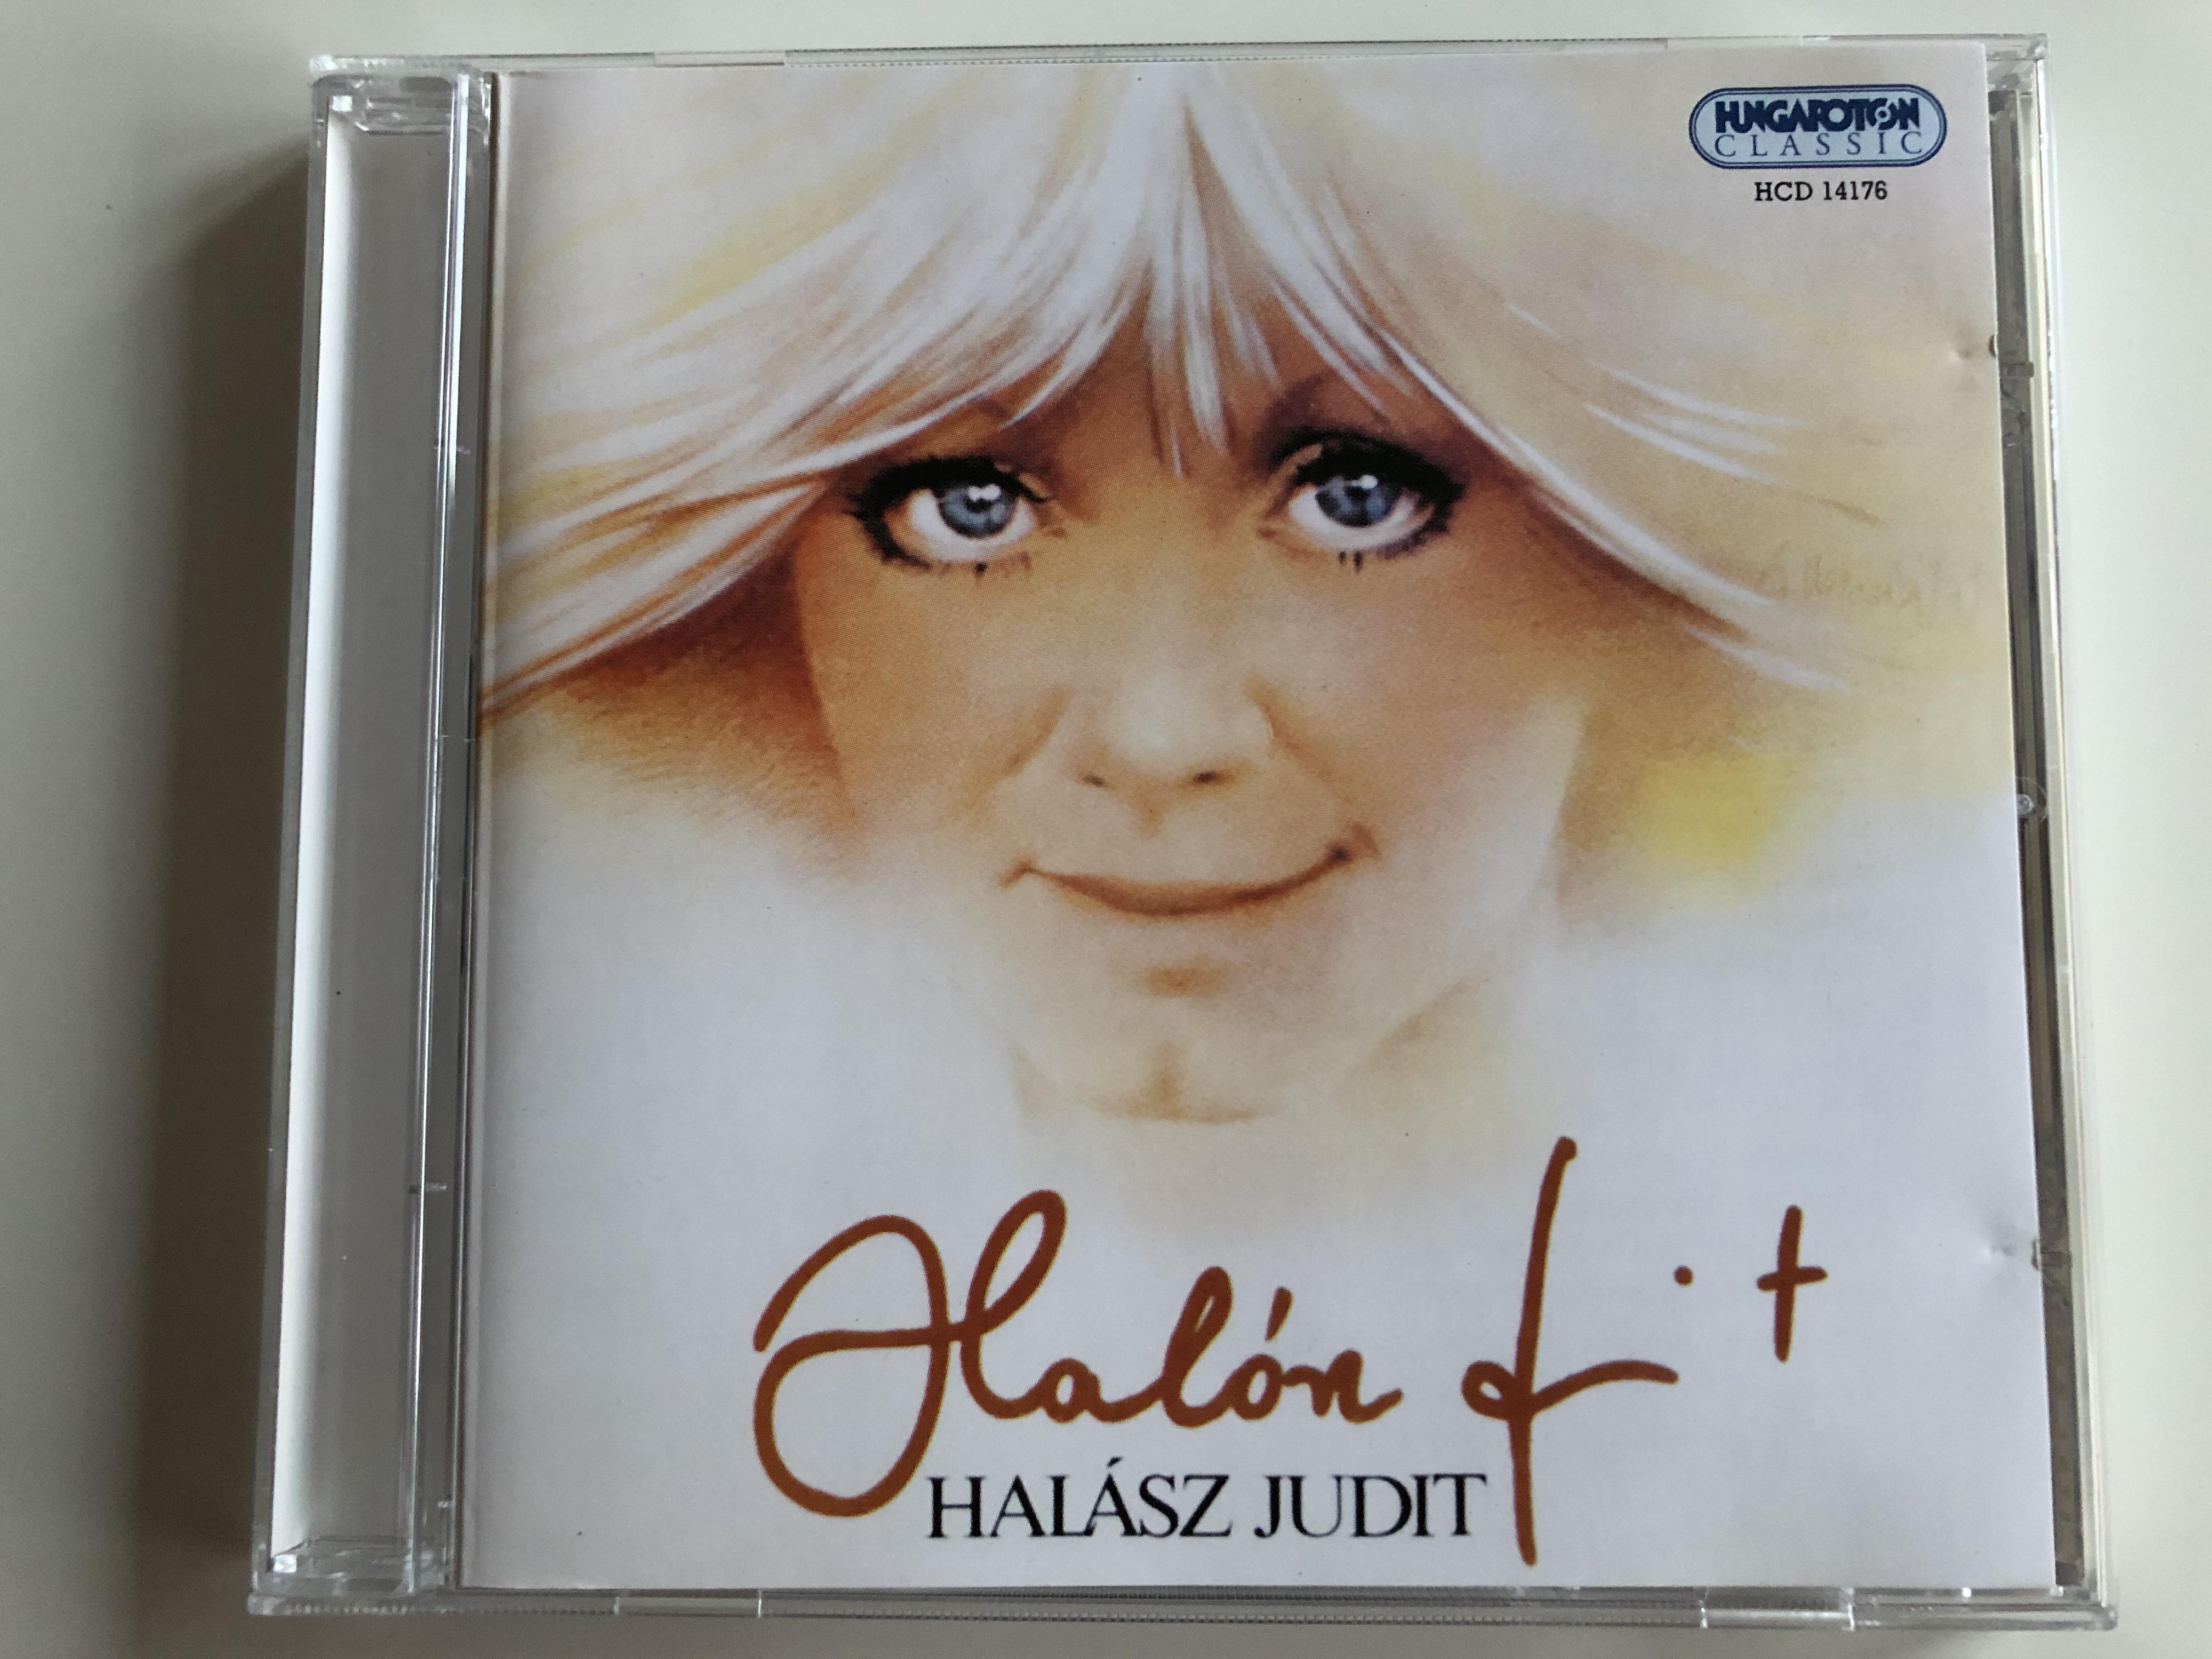 hal-sz-judit-hungaroton-classic-audio-cd-1994-stereo-hcd-14176-1-.jpg